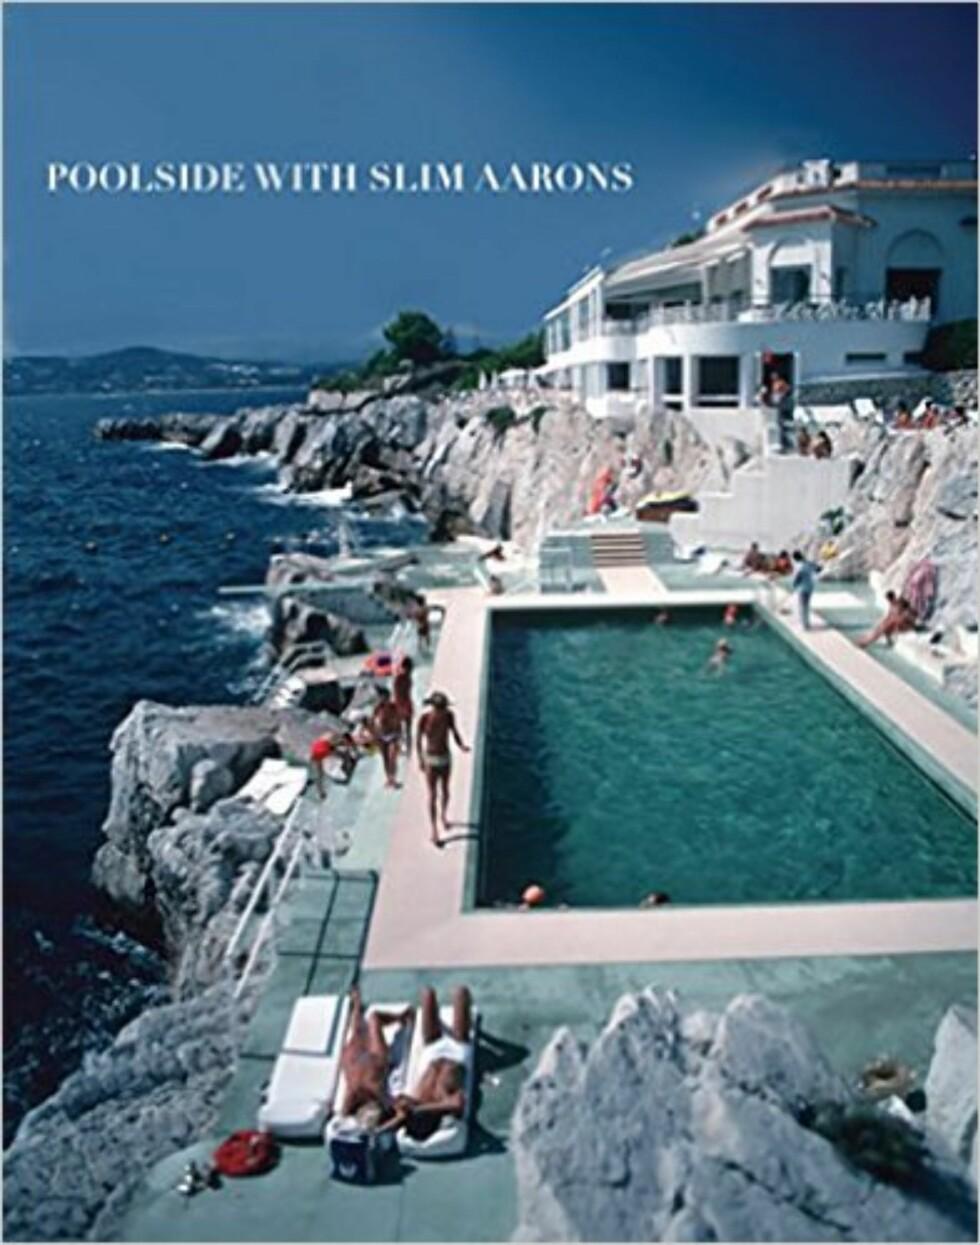 Poolside via Amazon.com, kr 577.